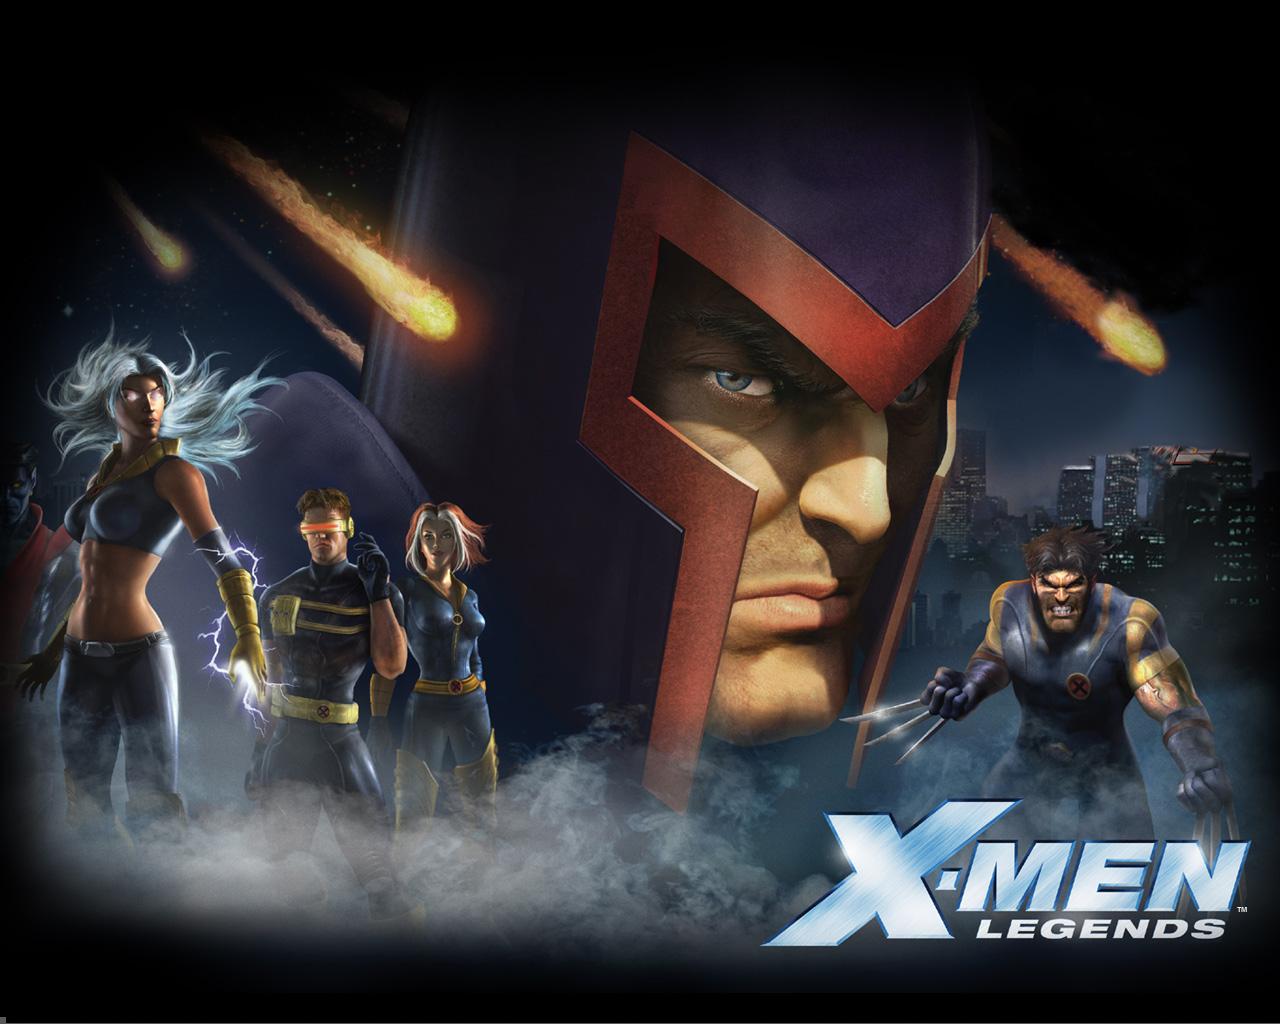 Wallpapers X-Men LegendsX Men Wallpaper